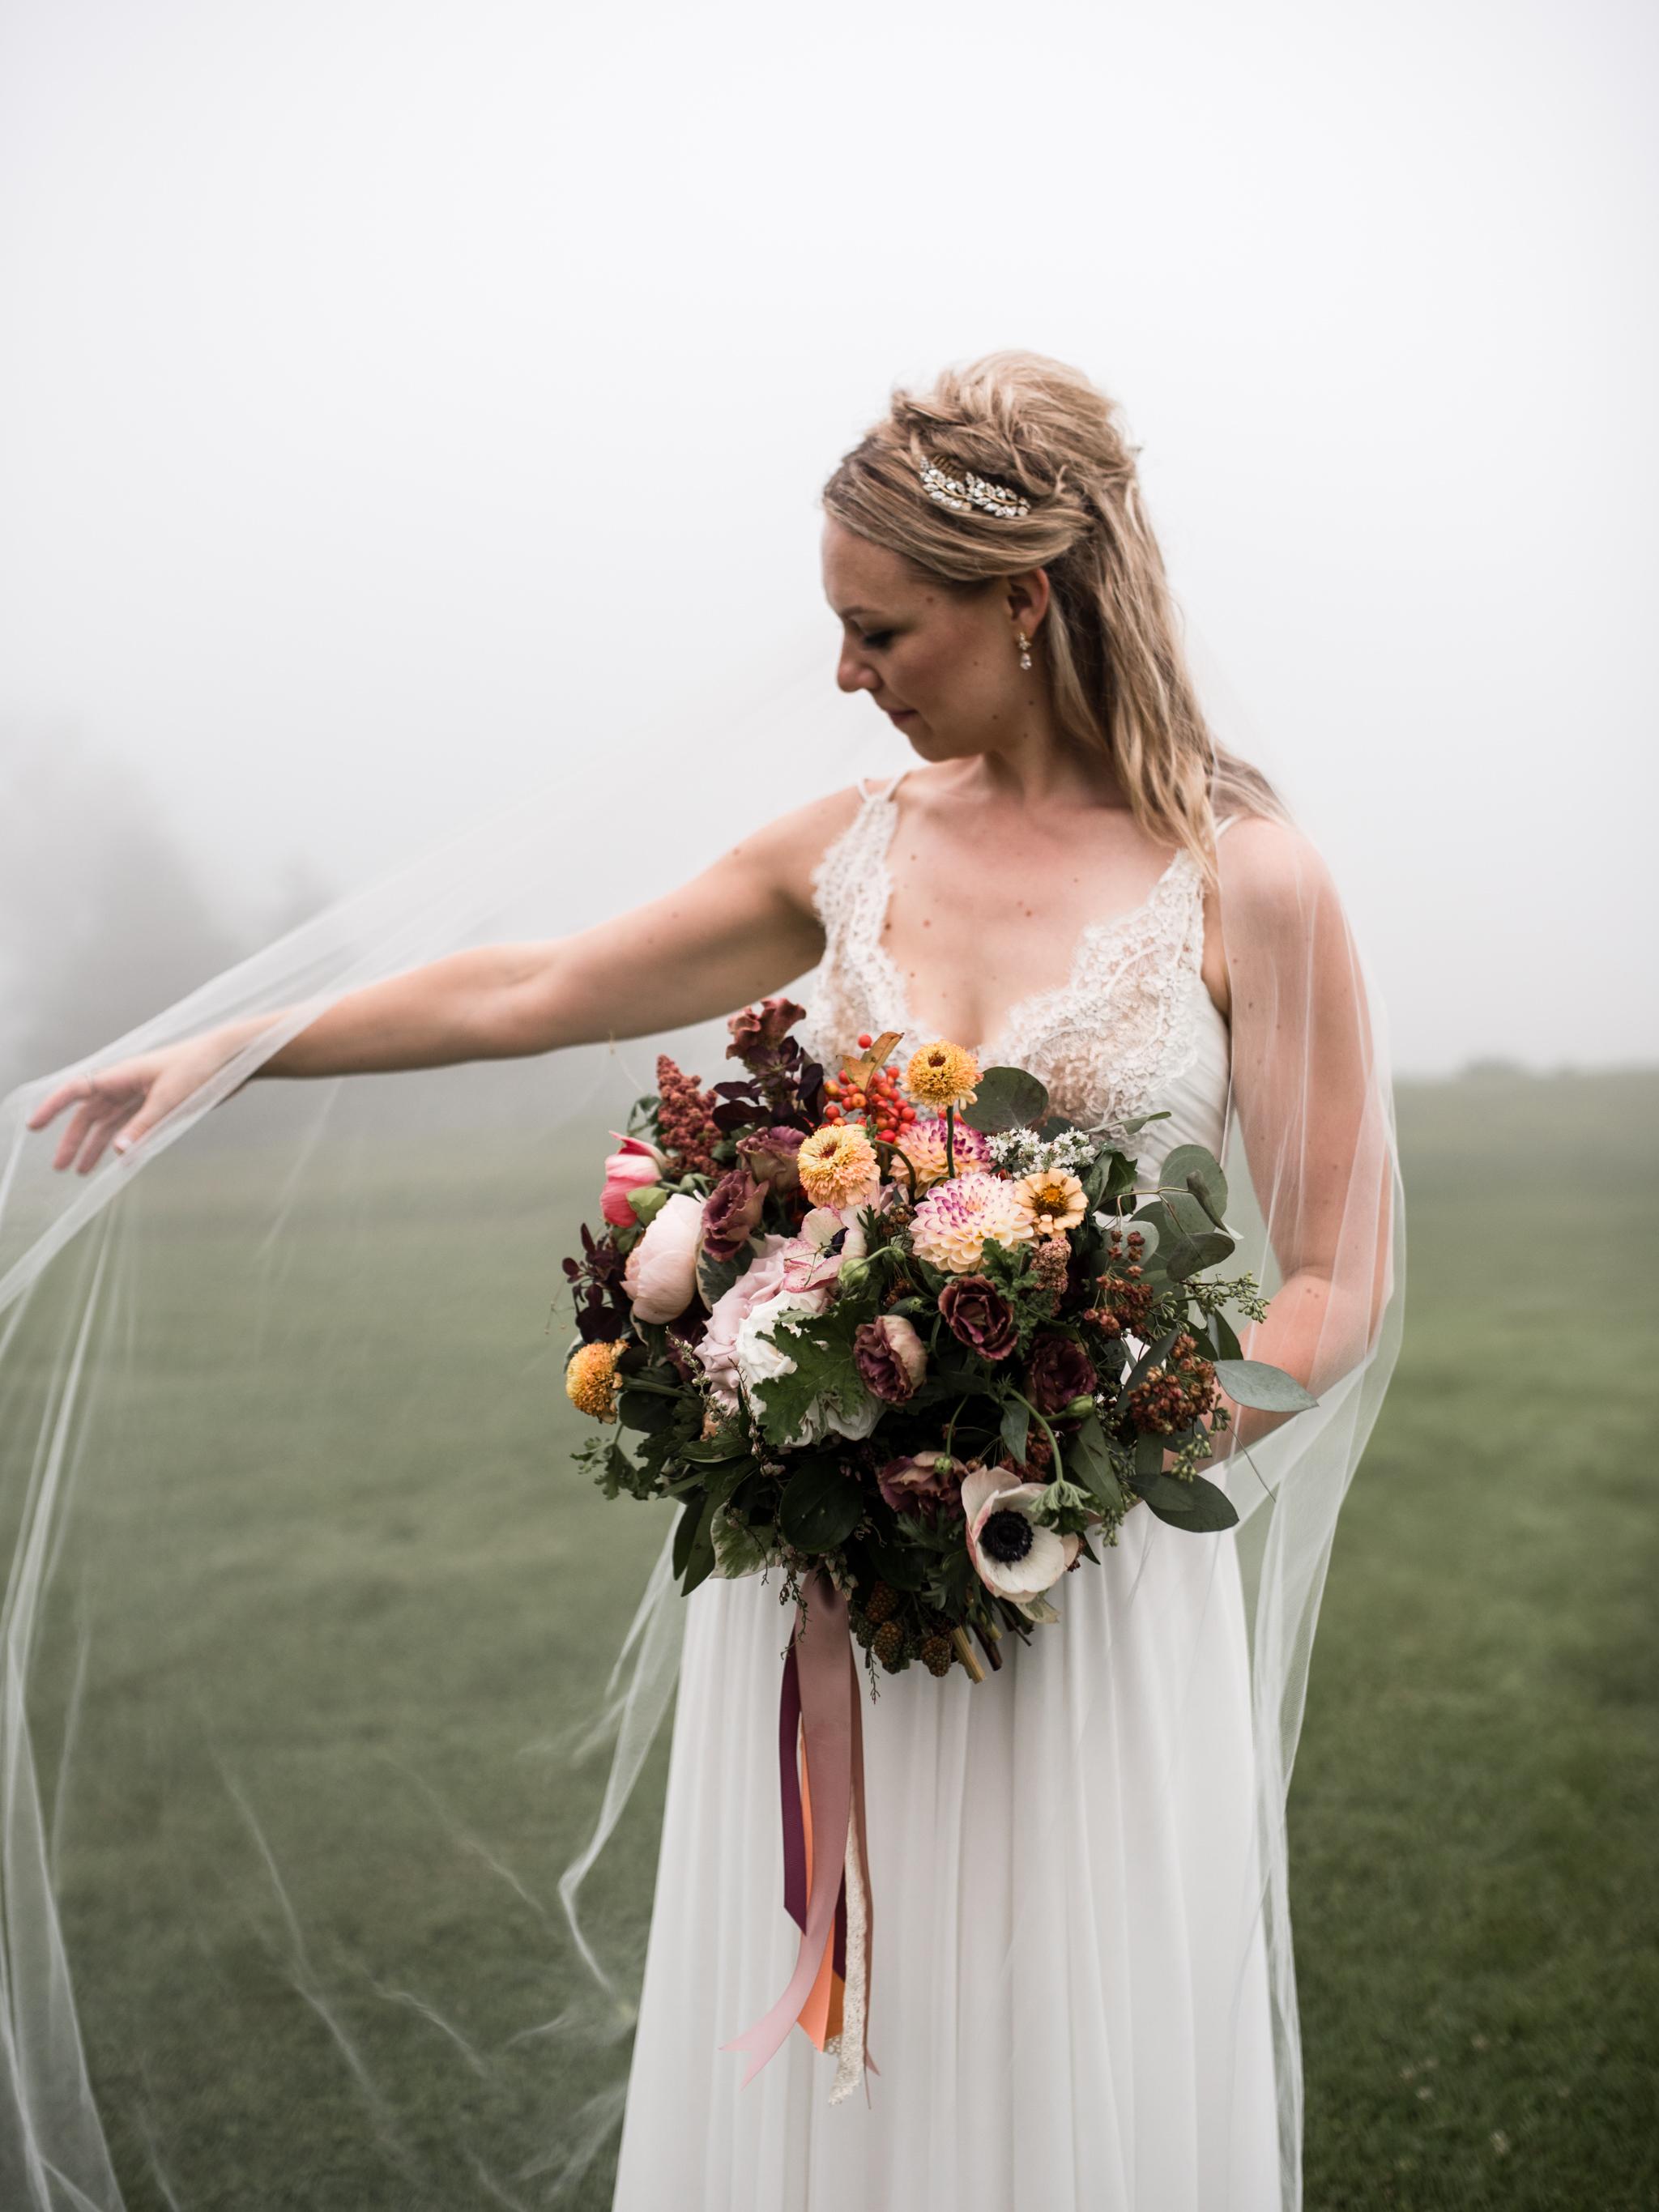 skyloft-wedding-toronto-wedding-photographer-57.jpg